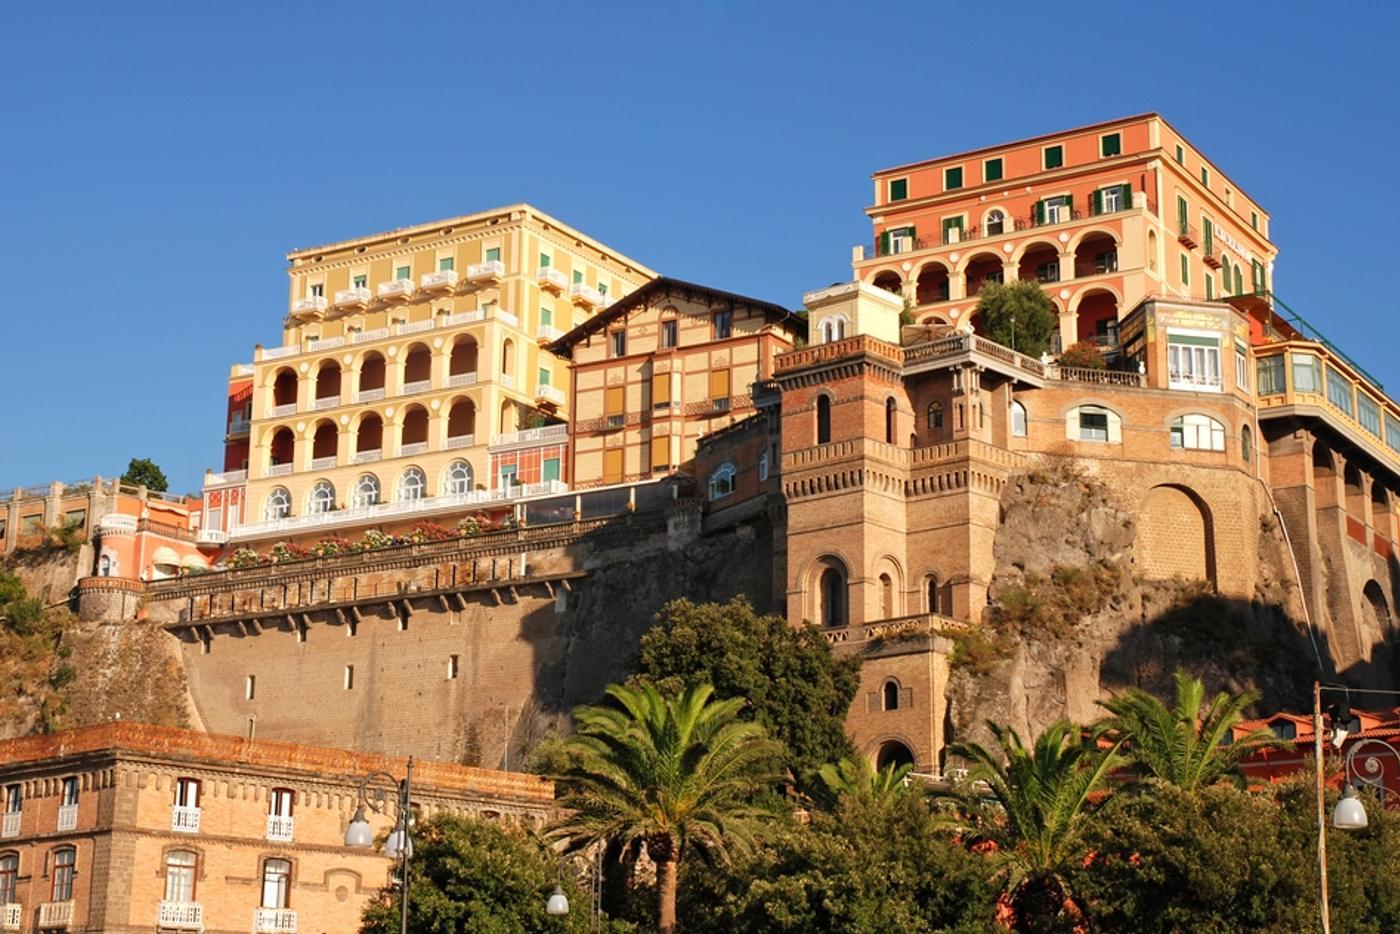 Photo Tour of Amalfi Coast 13